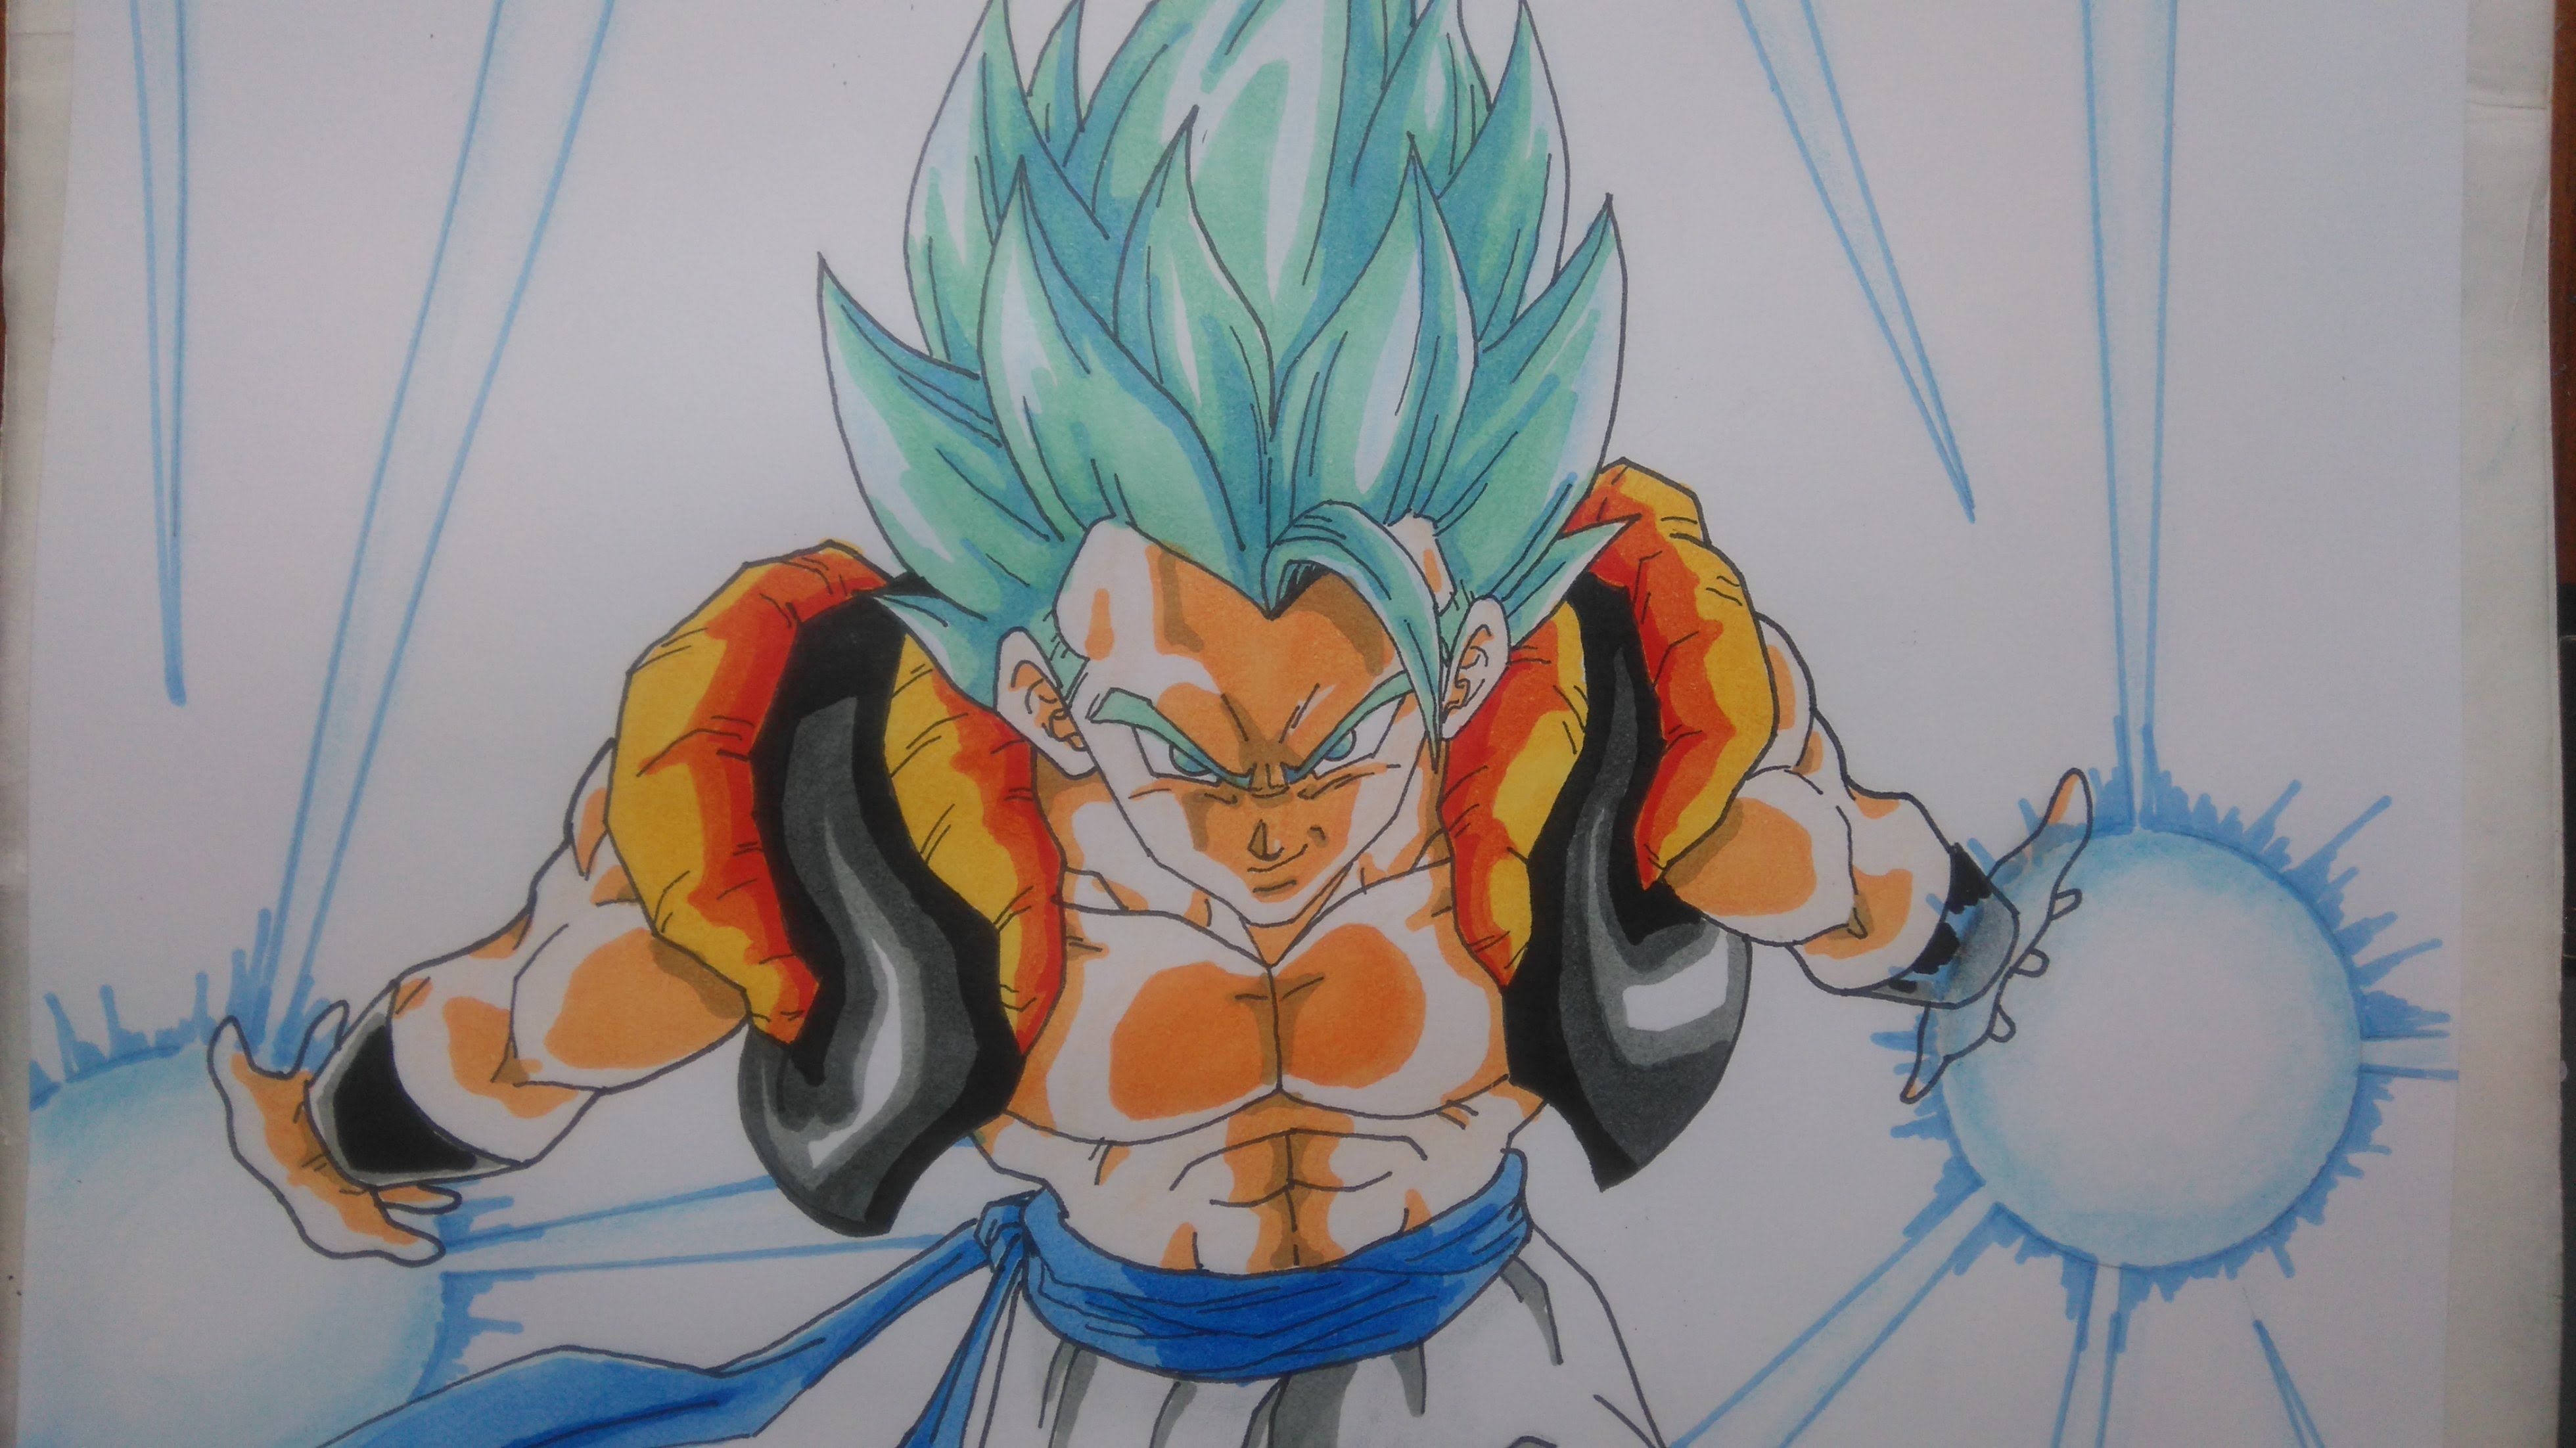 Goku Super Sayayin Dios Azul Para Colorear: Dibujando A Gogeta Super Saiyajin Dios Azul. How To Draw